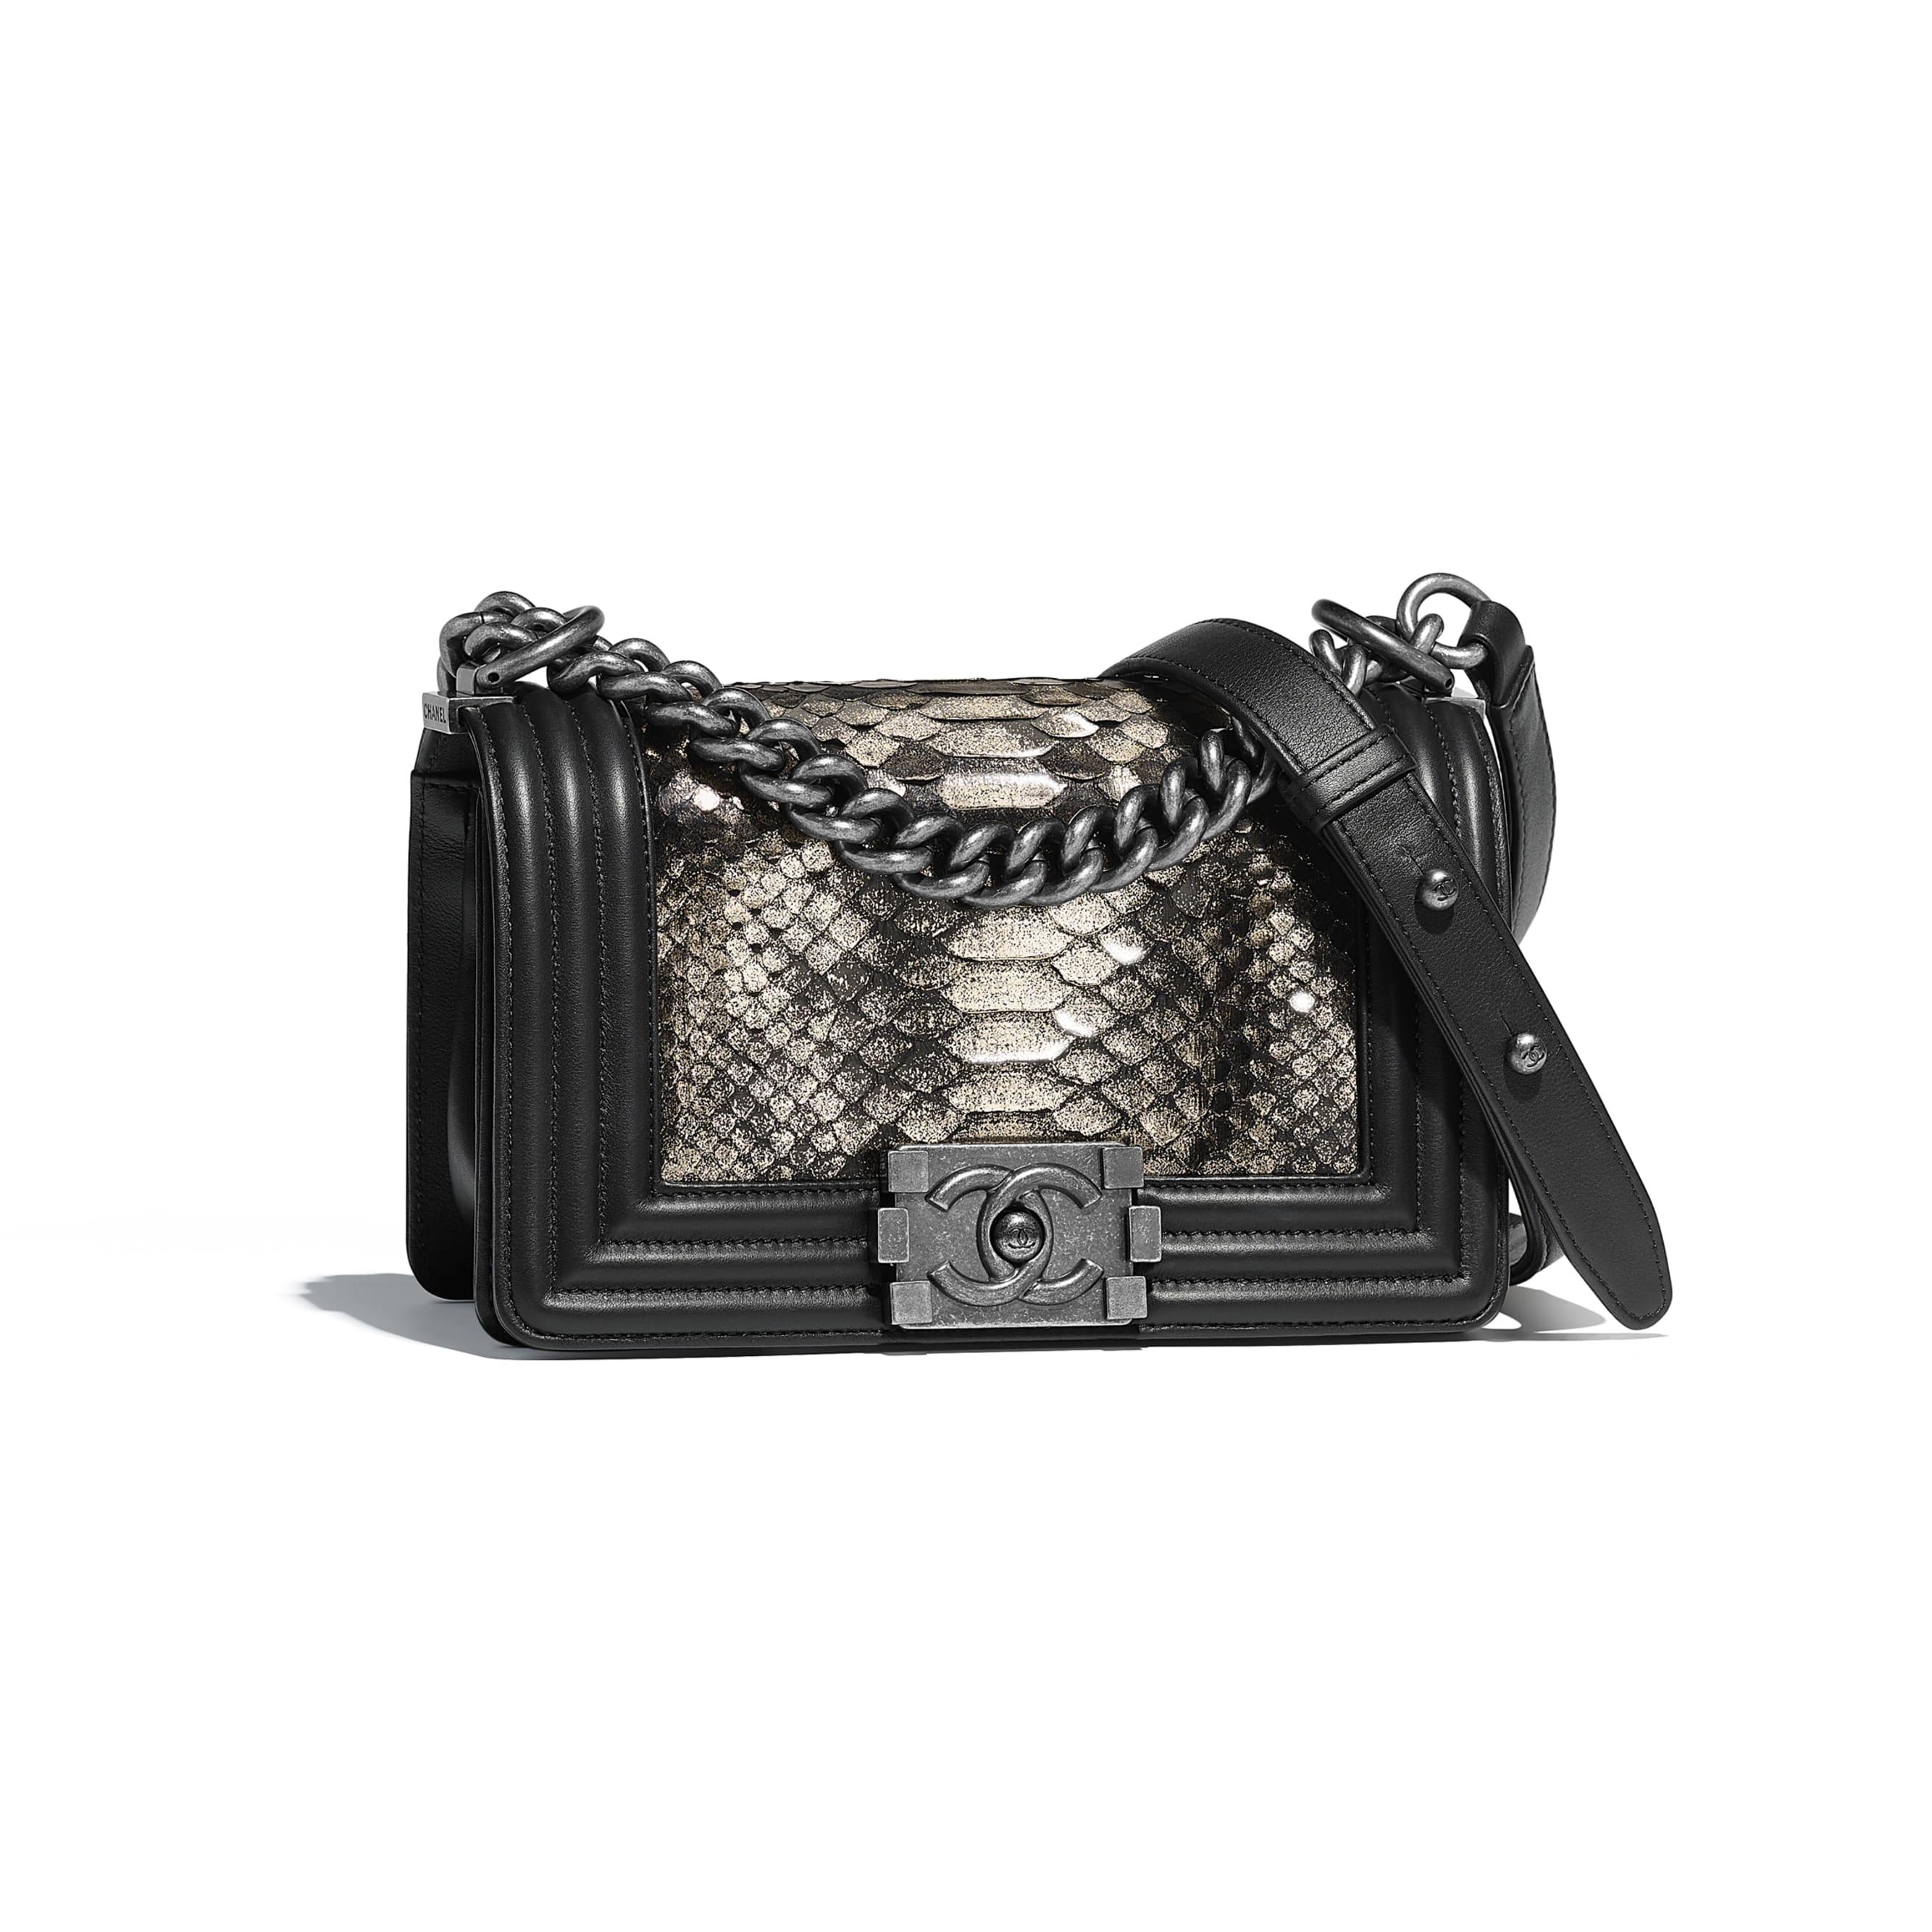 Small BOY CHANEL Handbag - Silver & Black - python, calfskin & ruthenium-finish metal - Default view - see standard sized version